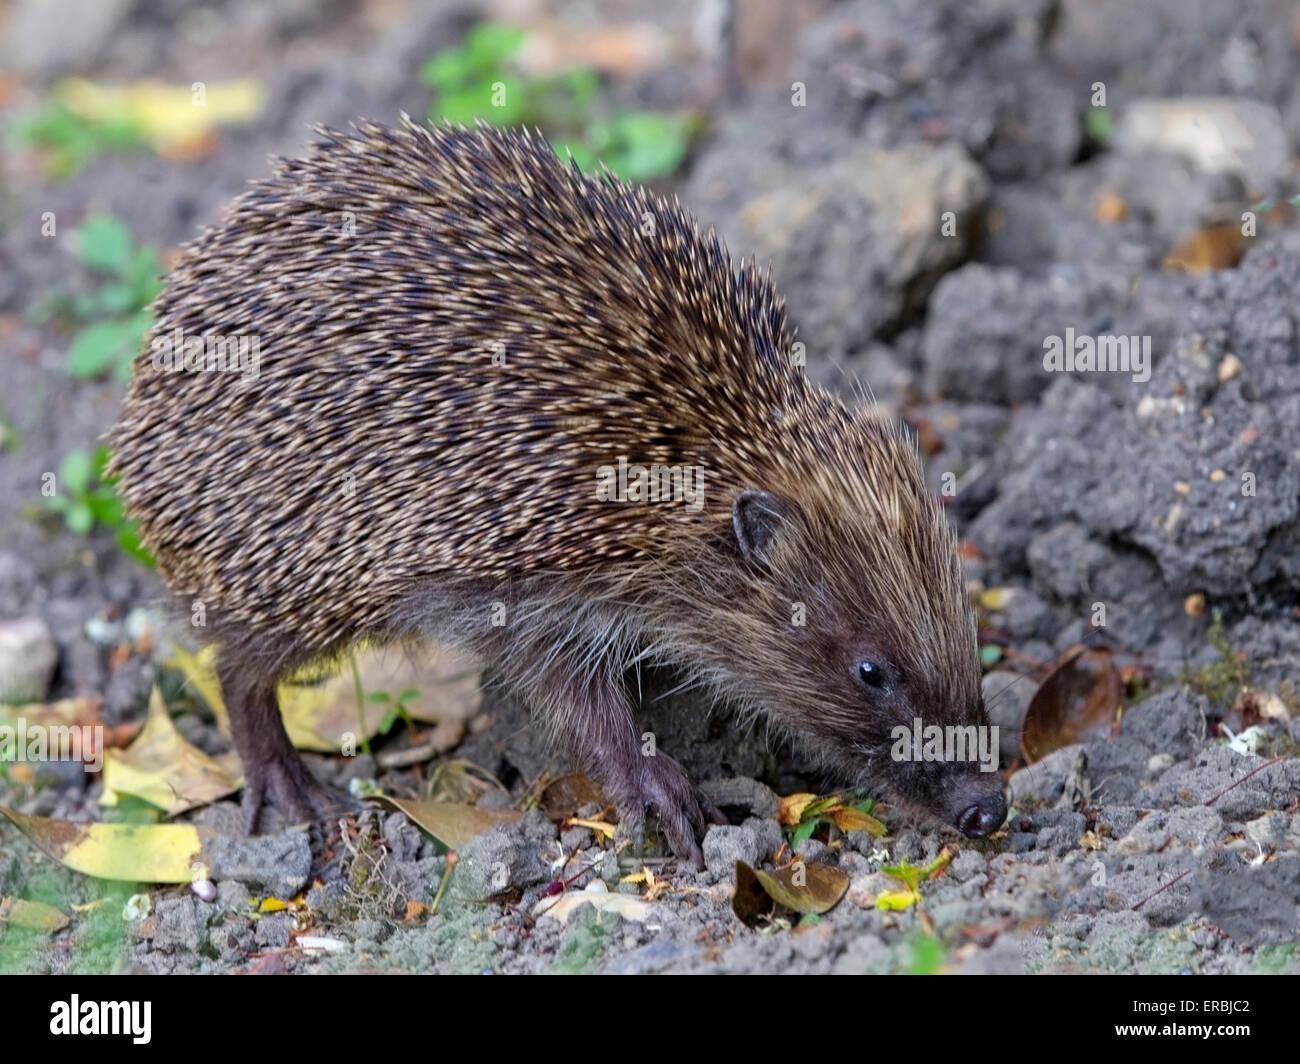 European hedgehog - Stock Image